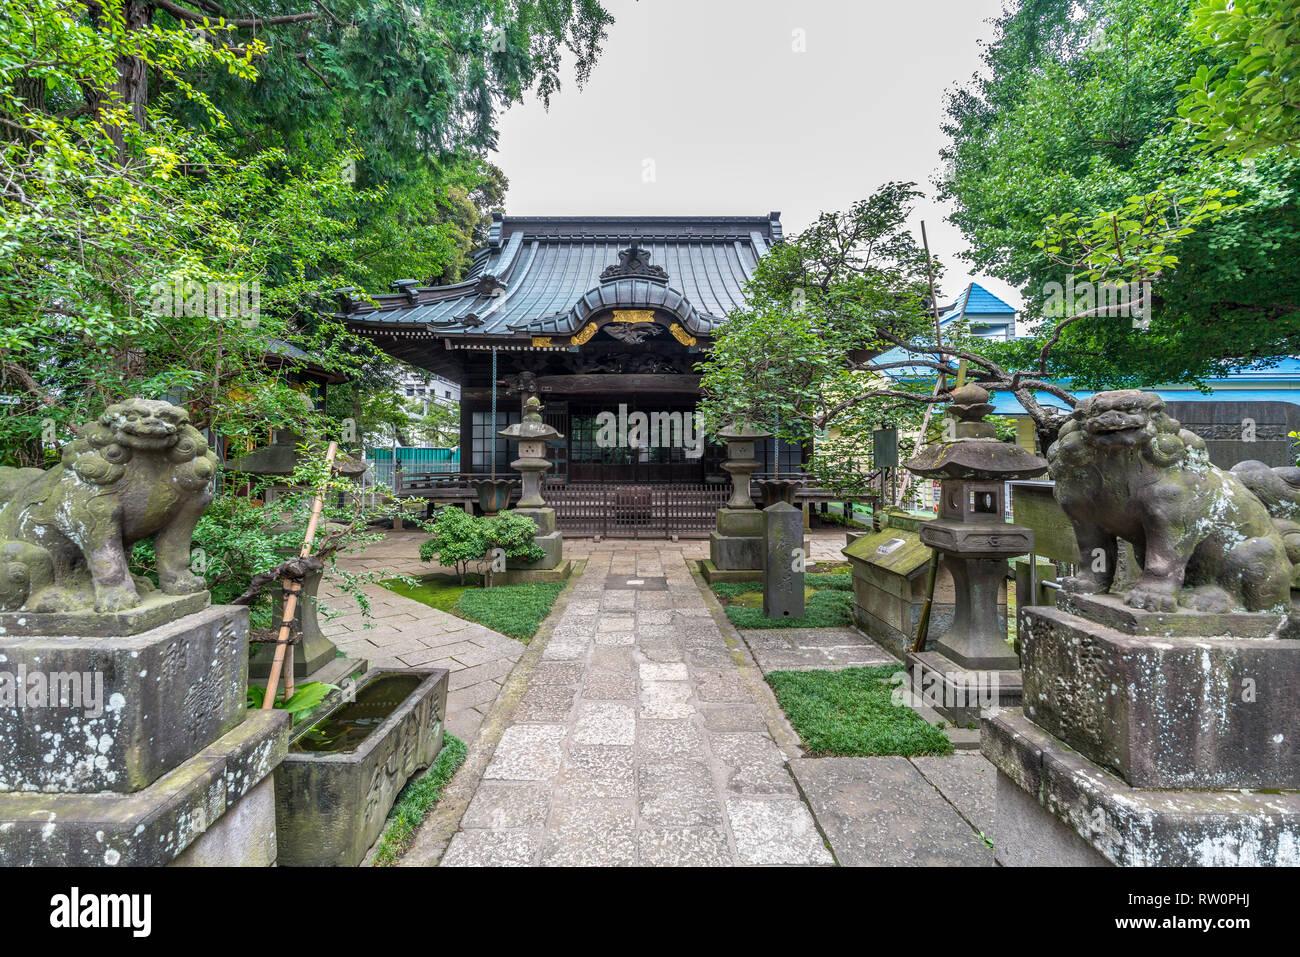 Setagaya, Tokyo, Japan - August 19, 2017: Moriiwao Temple. Awashimado hall devoted to Awashima-sama shinto deity who protects women from illness Stock Photo